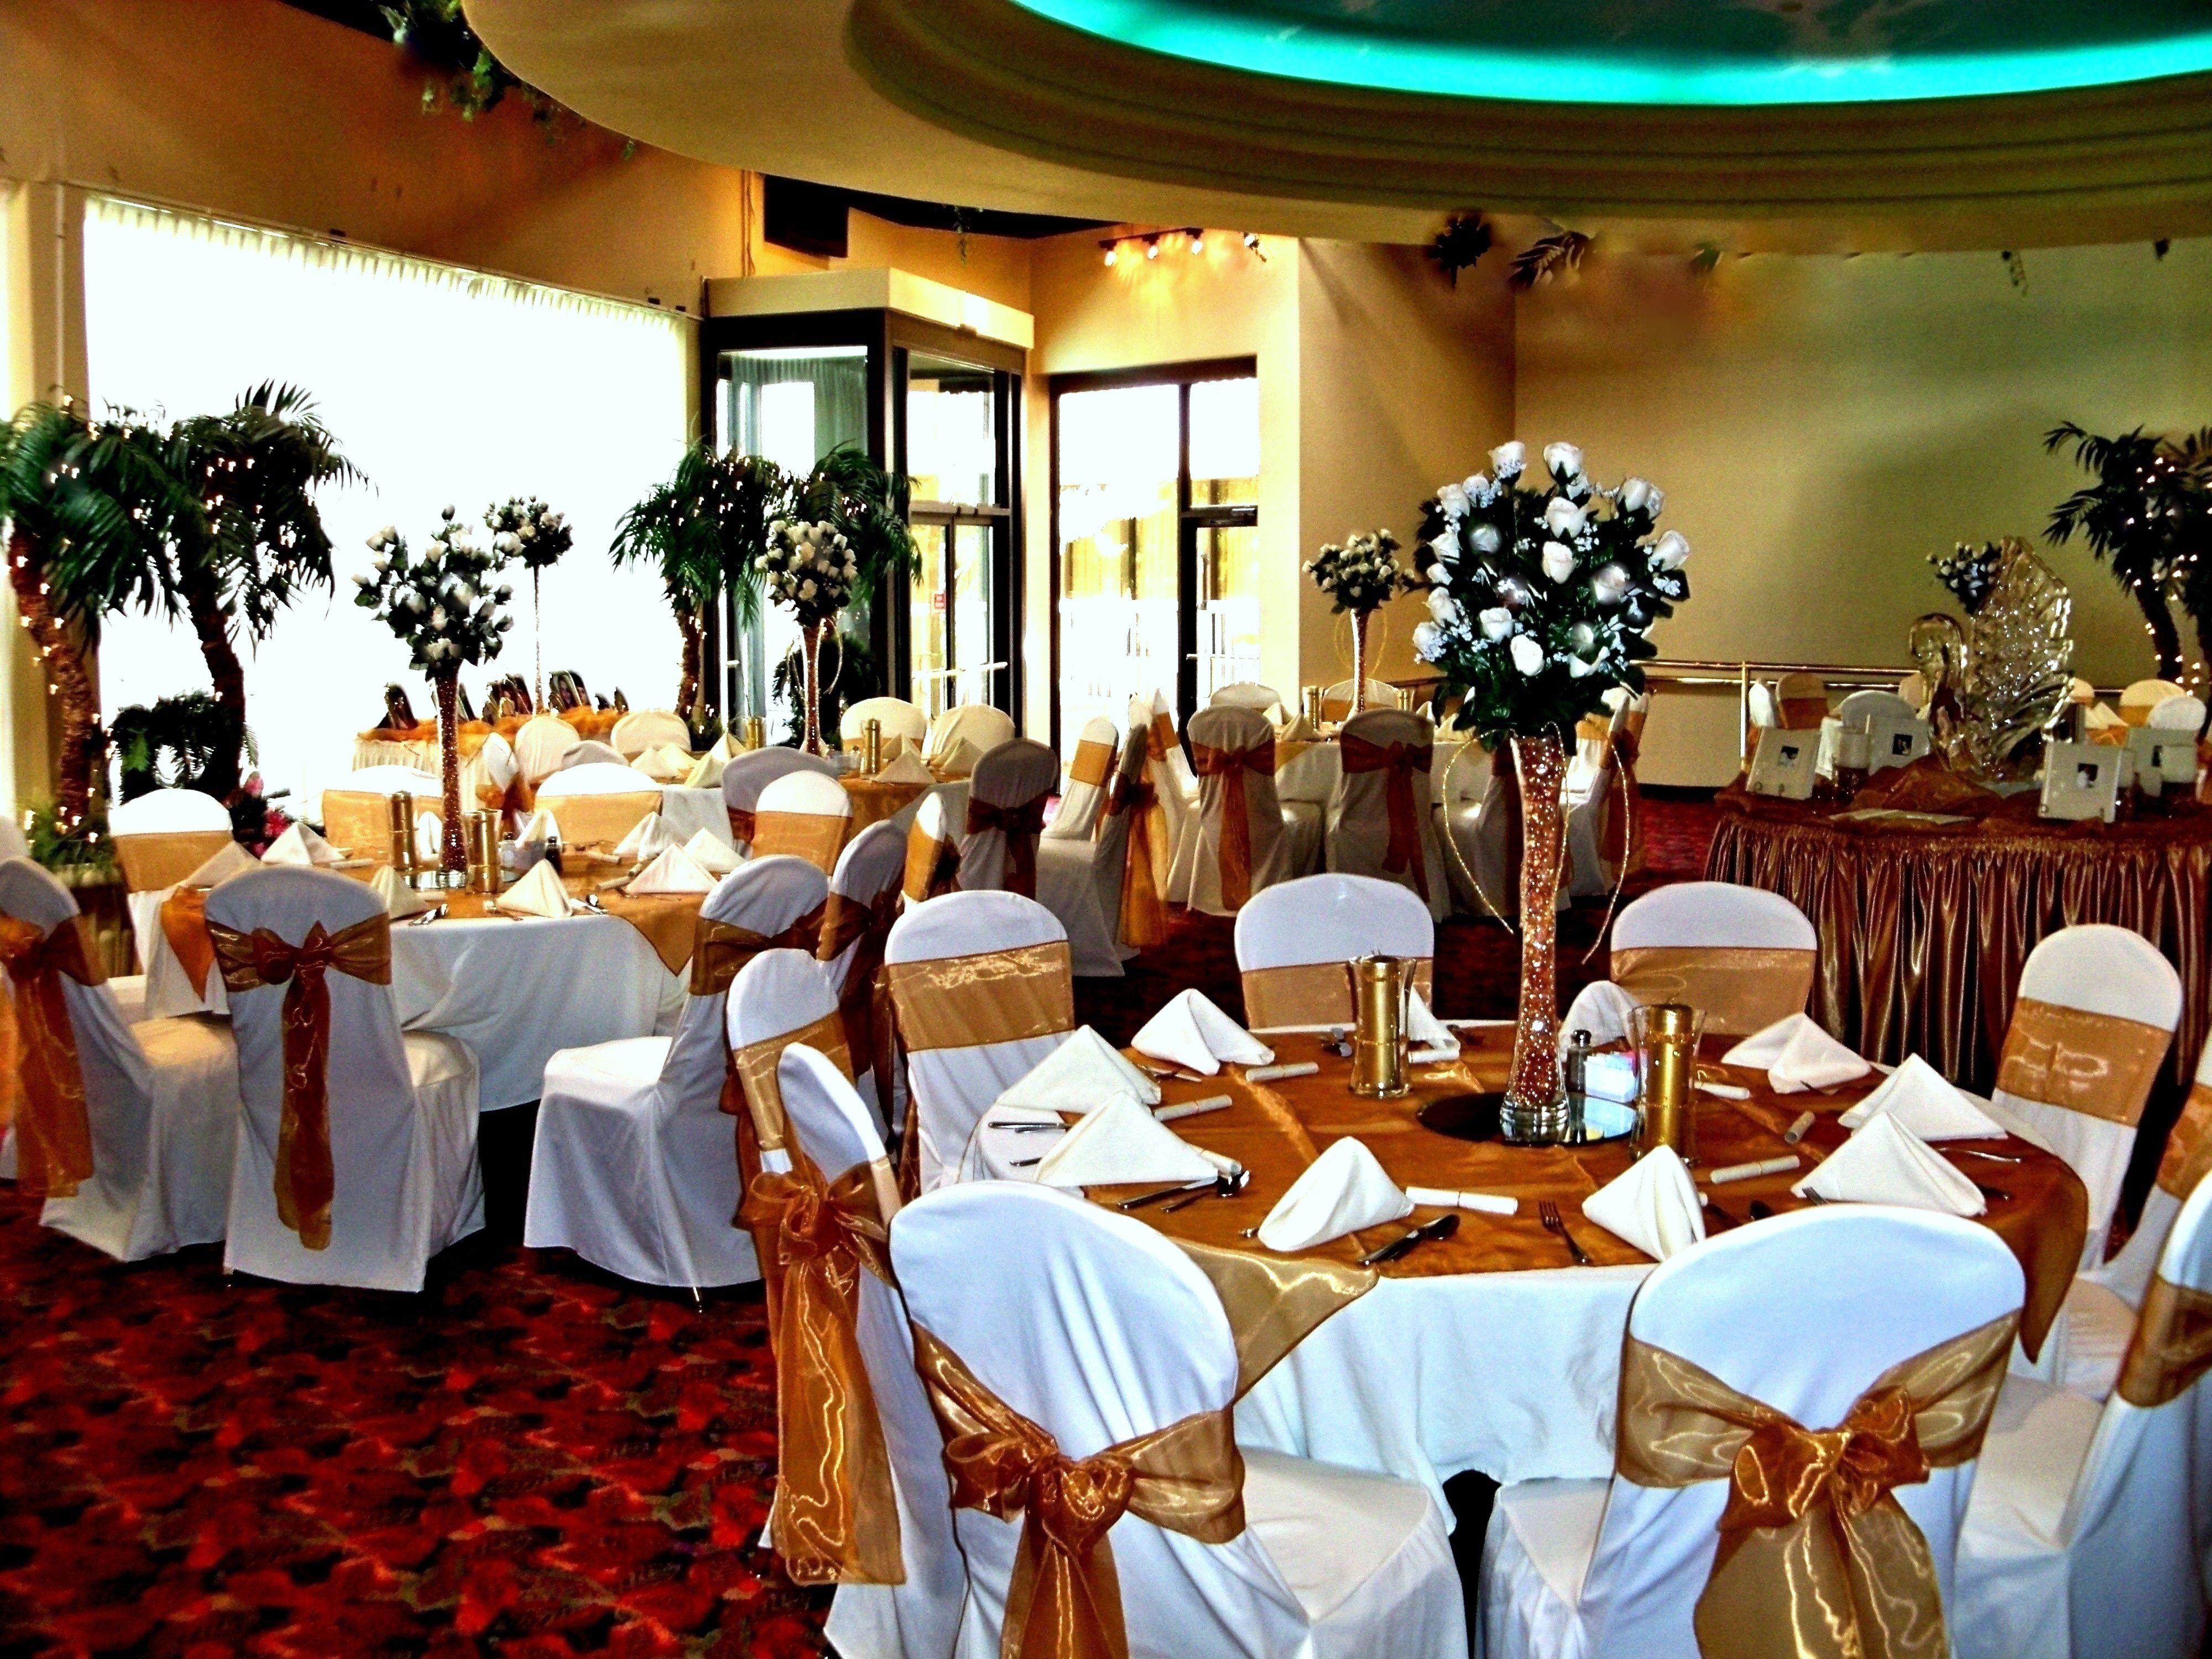 Weir 50th wedding anniversary celebration dinner at the mcm elegante